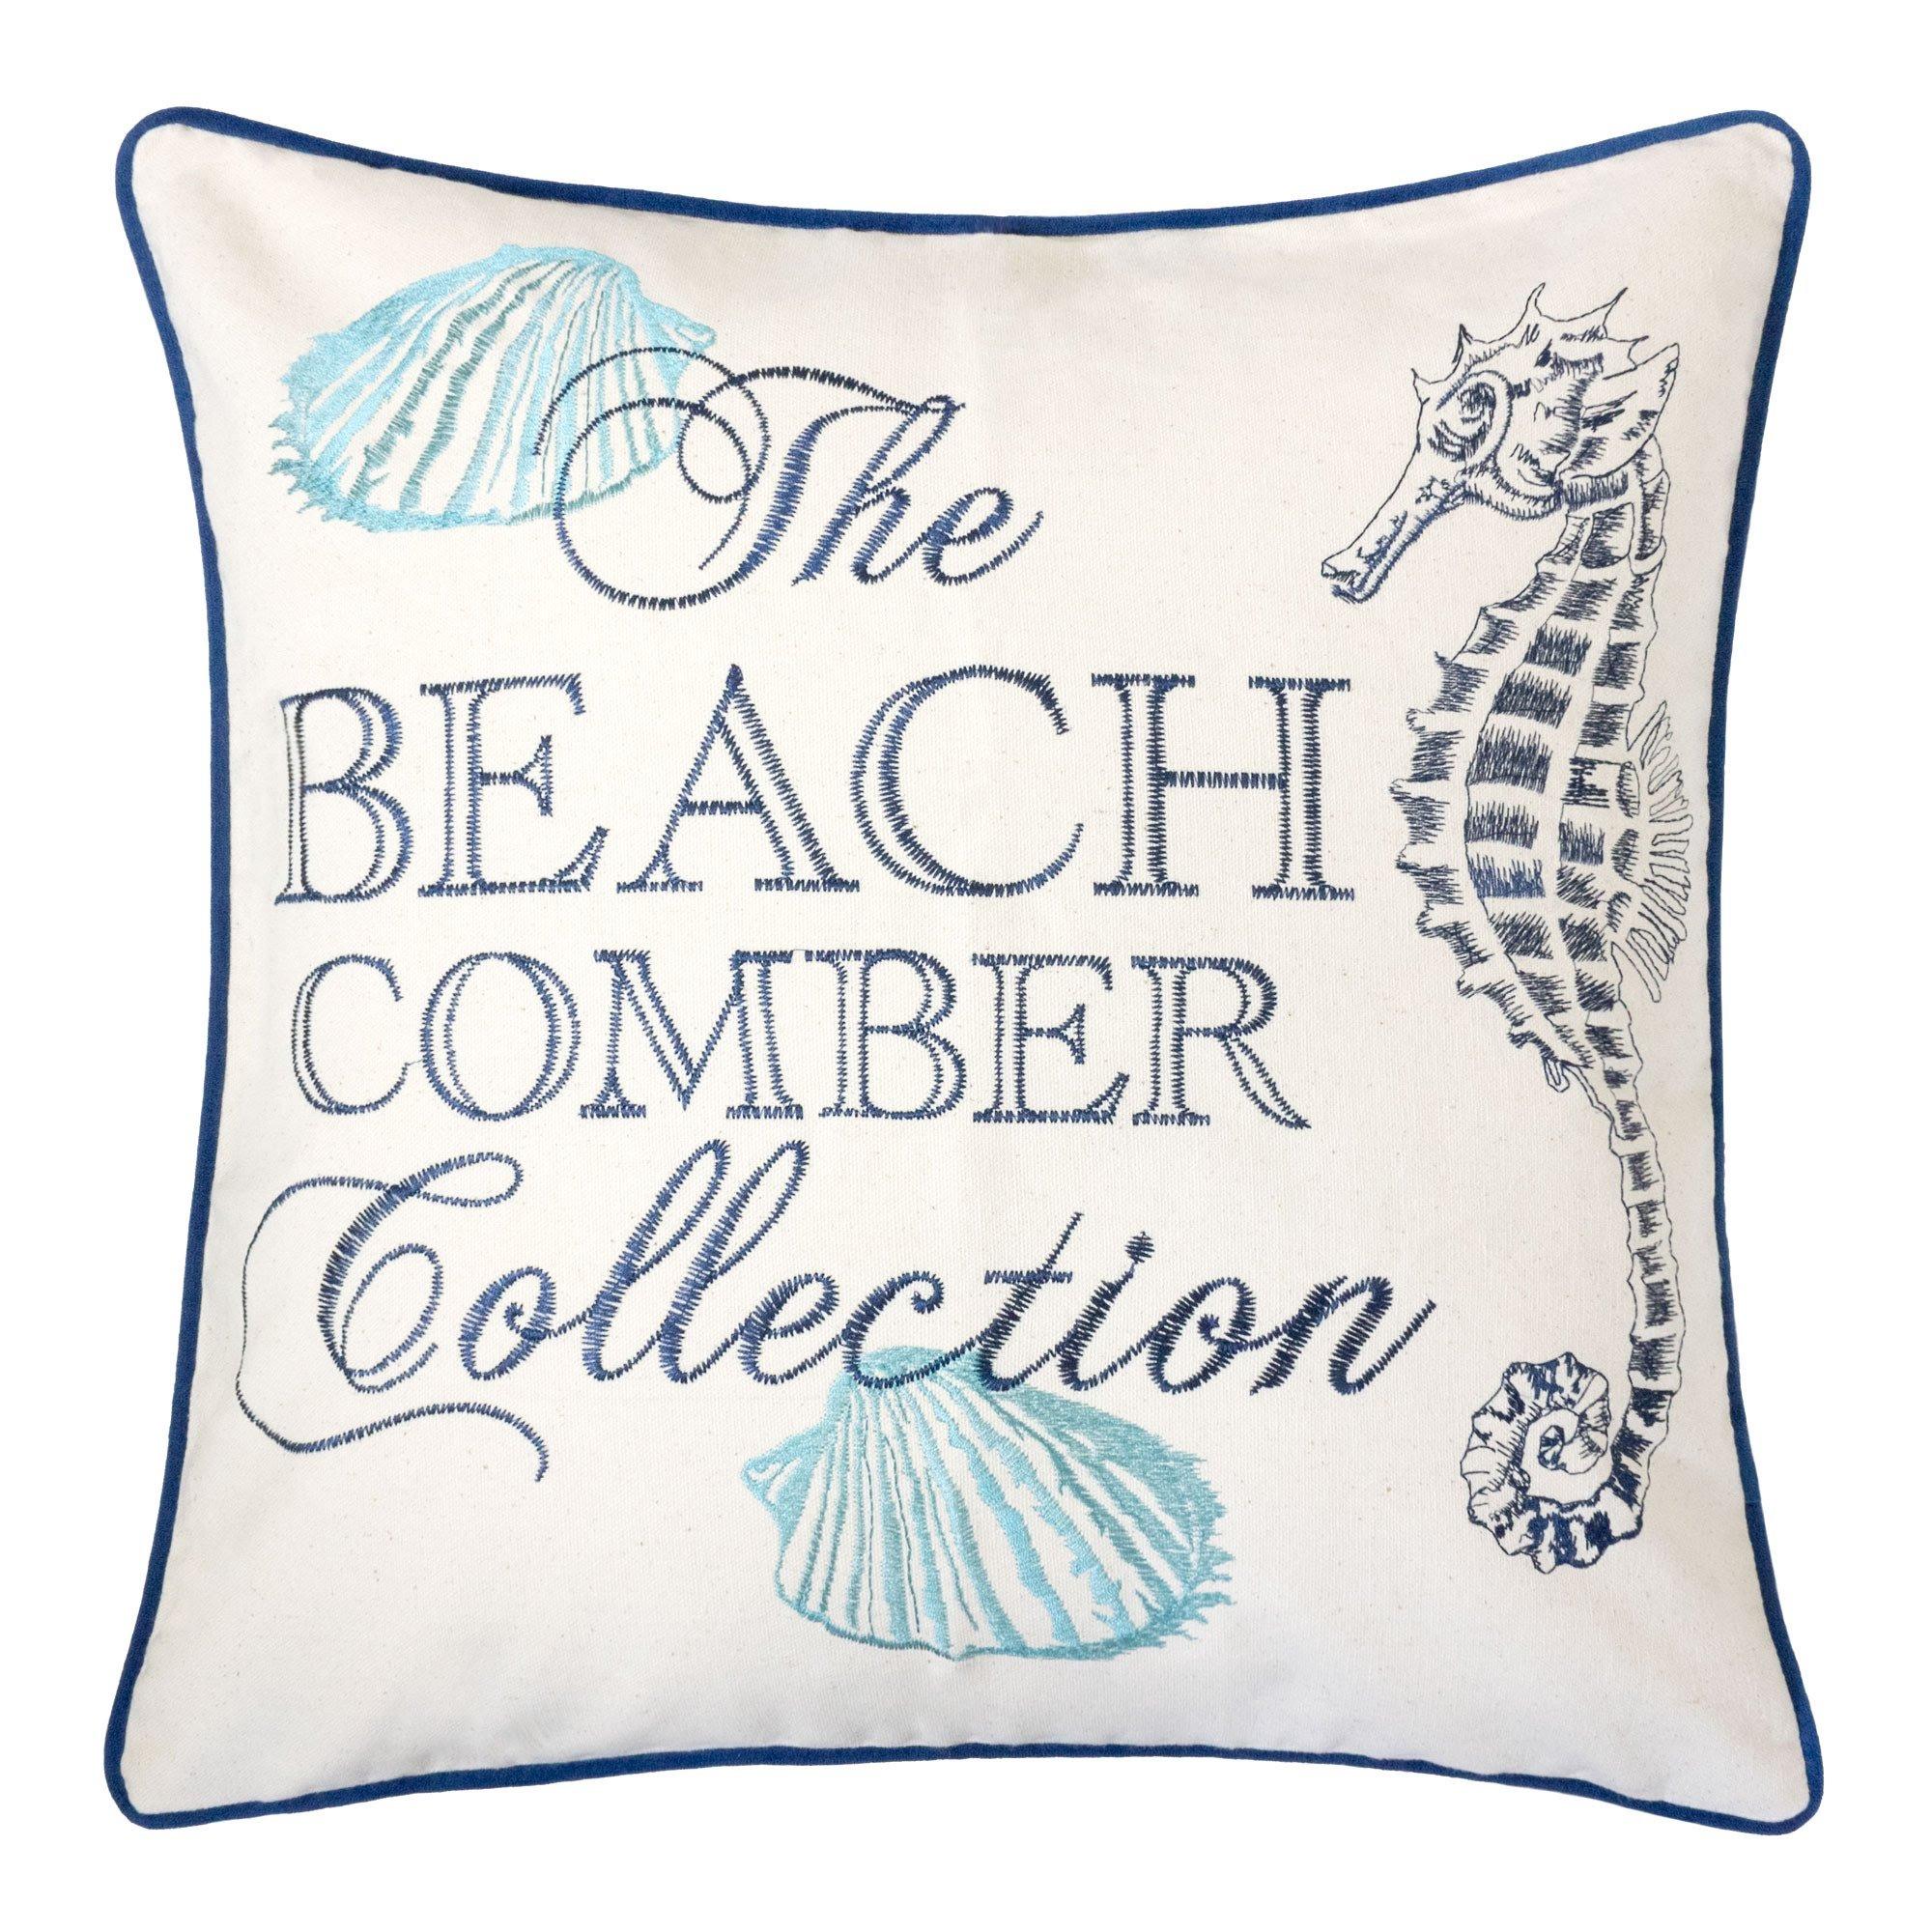 Homey Cozy Embroidery Cotton Canvas Throw Pillow Cover,The Beach Comber Collection Navy Piping Nautical Decorative Pillow Case Coastal Beach Theme Home Decor 20x20,Cover Only